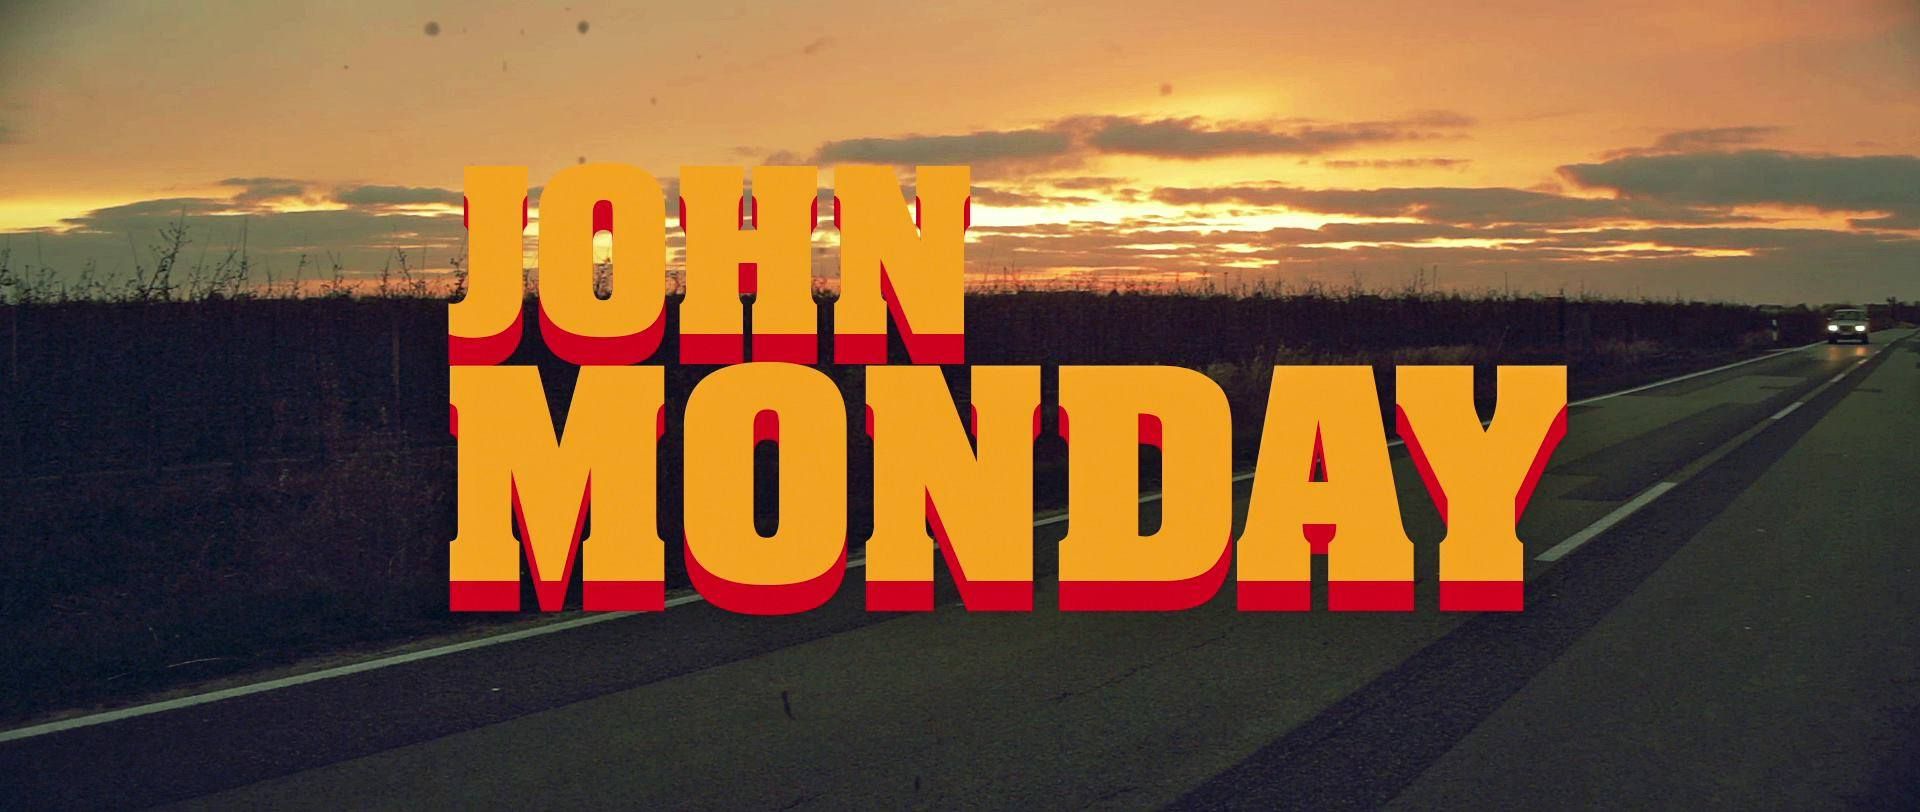 John Monday - Rock